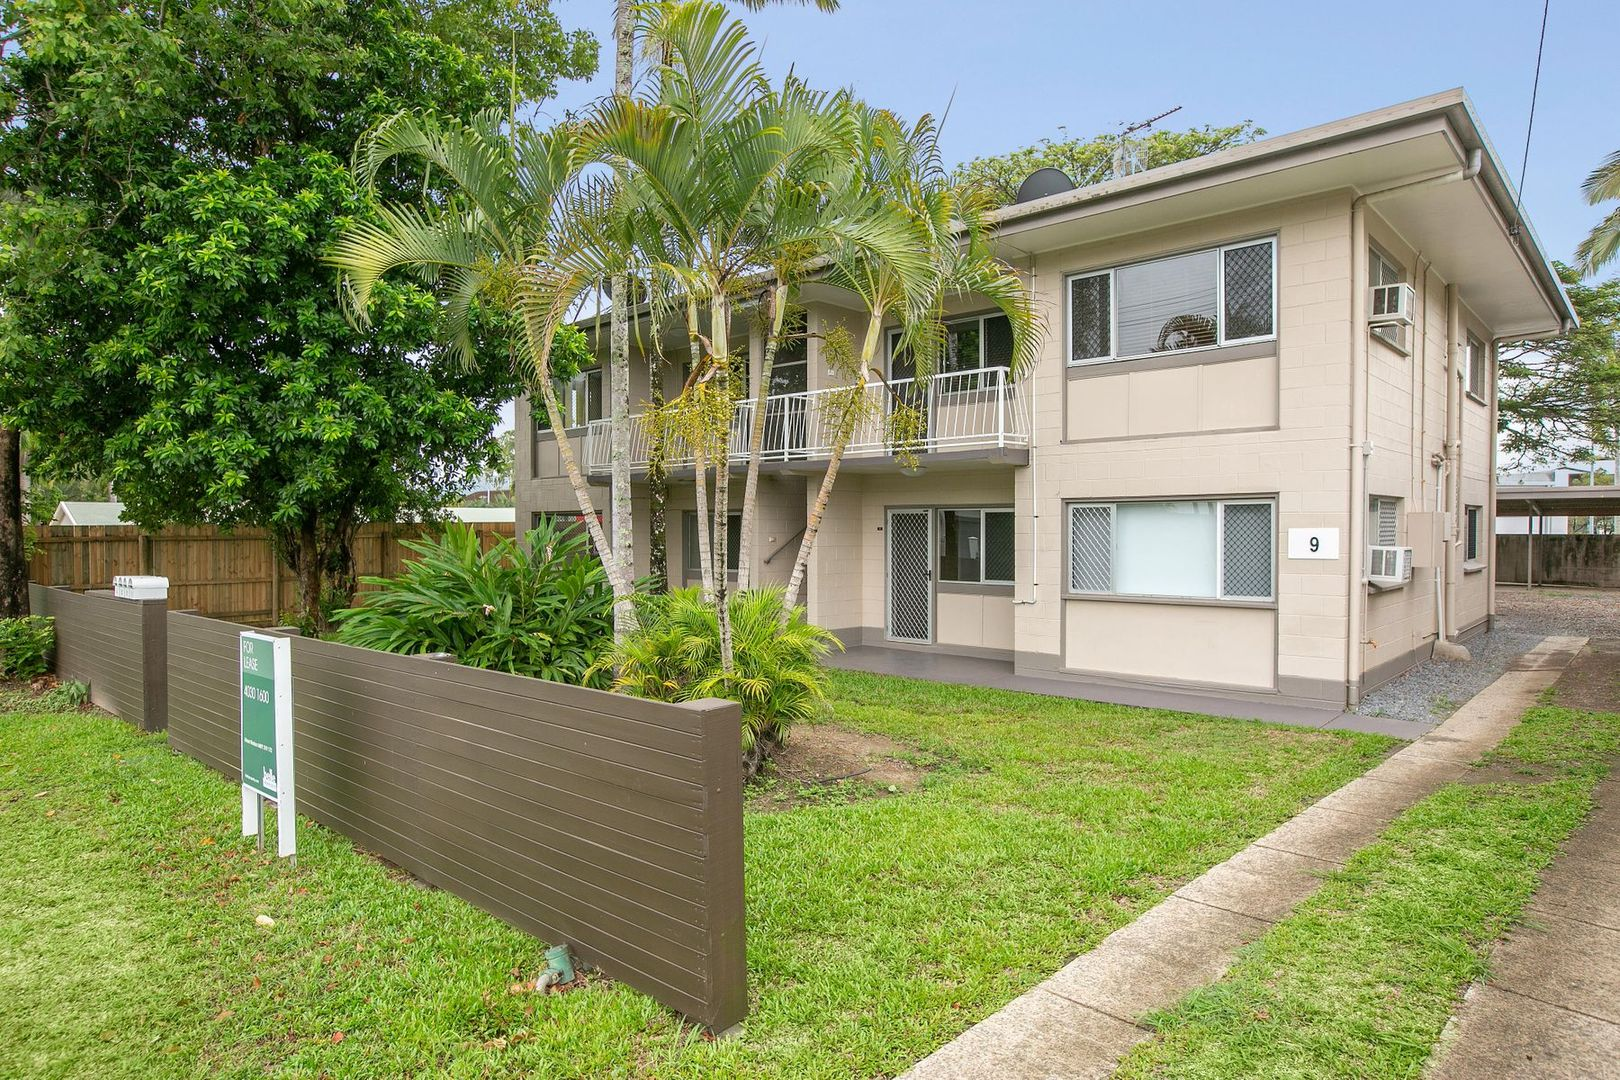 4/9 Sondrio Street, Woree QLD 4868, Image 0